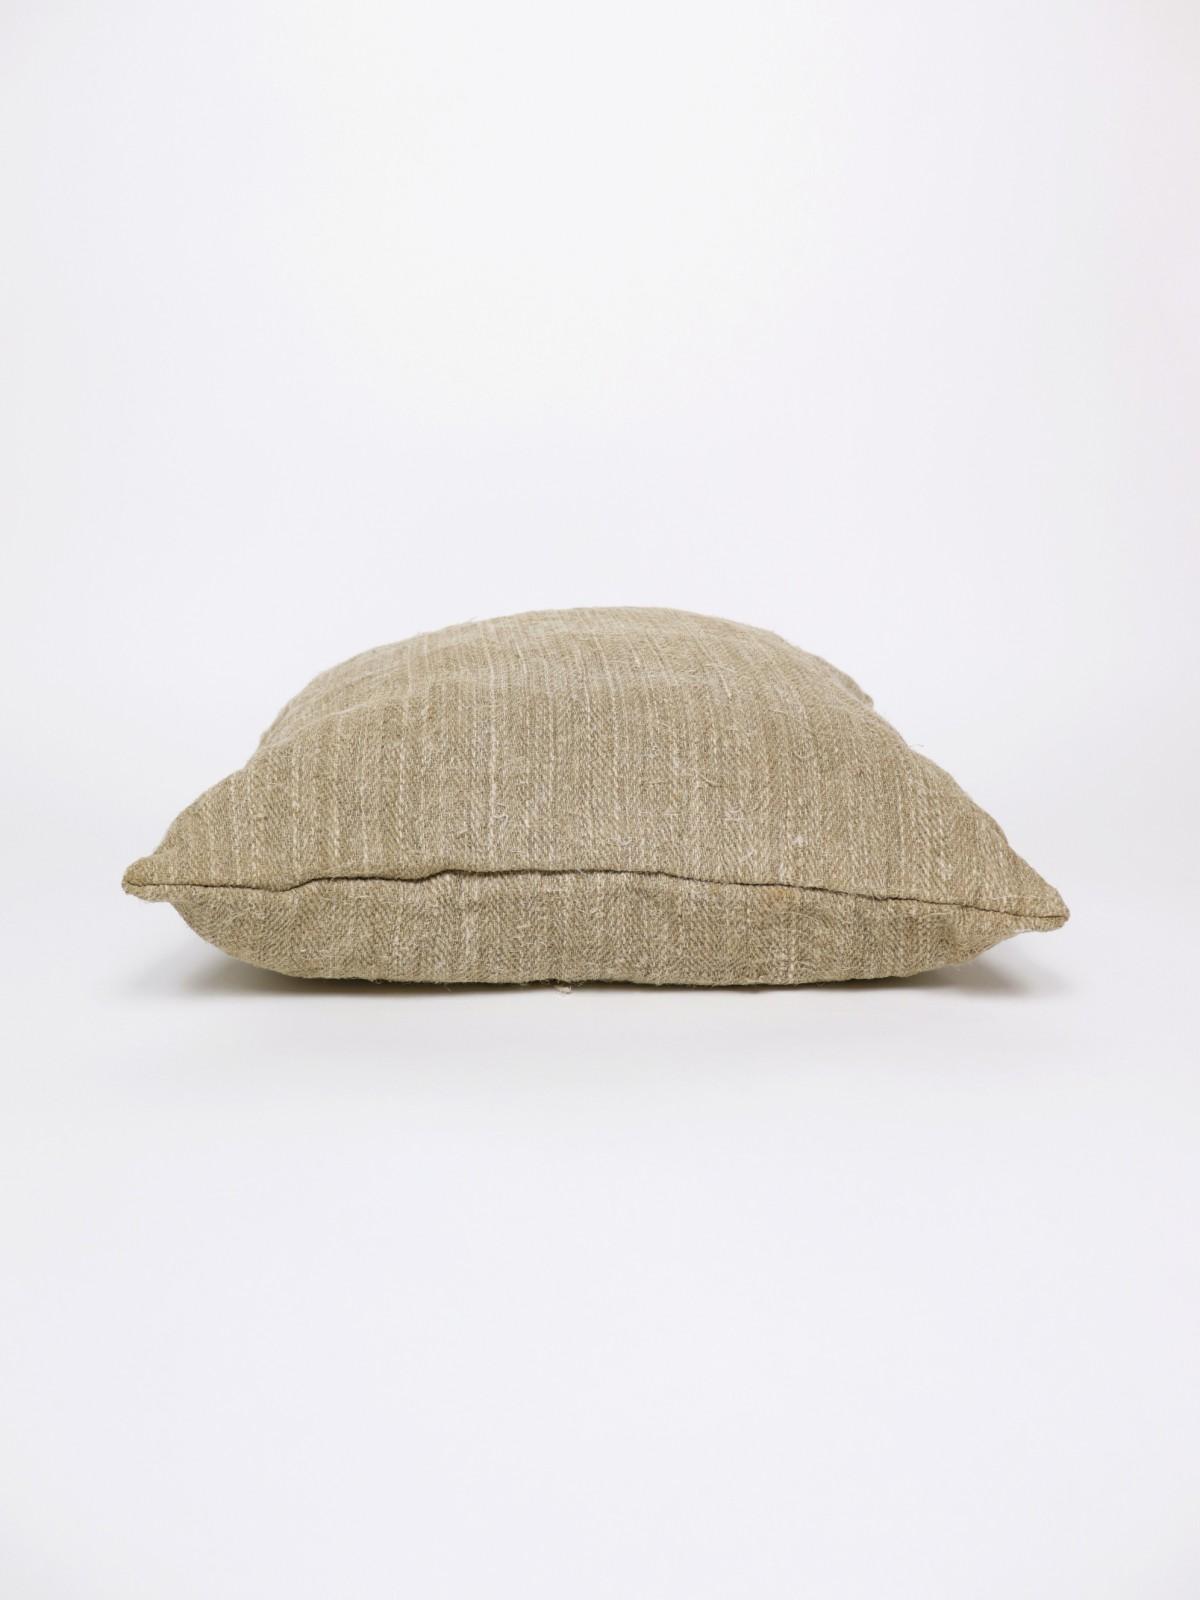 1950's grain sack fabric cushion, vintage hemp fabric cushion, brown.remake cushion